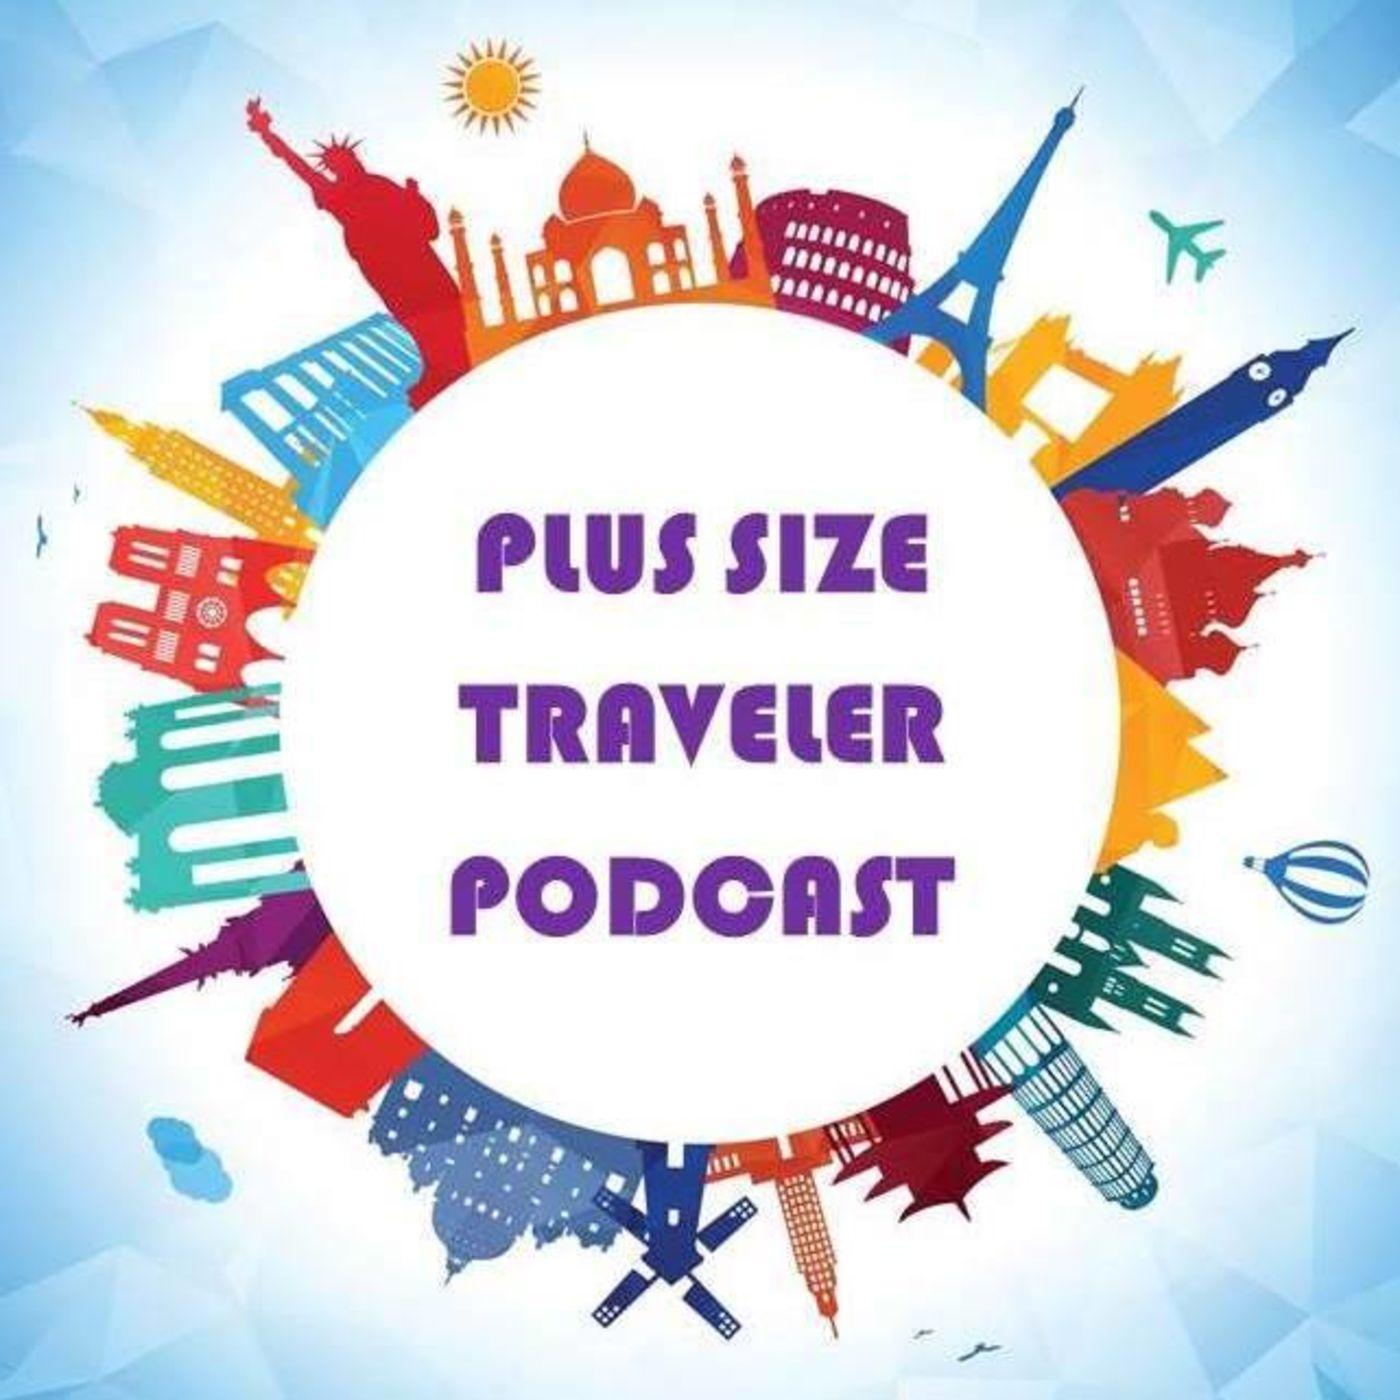 Plus Size Traveler Podcast: Sorrento & Pompeii, Italy and Travel Shoes